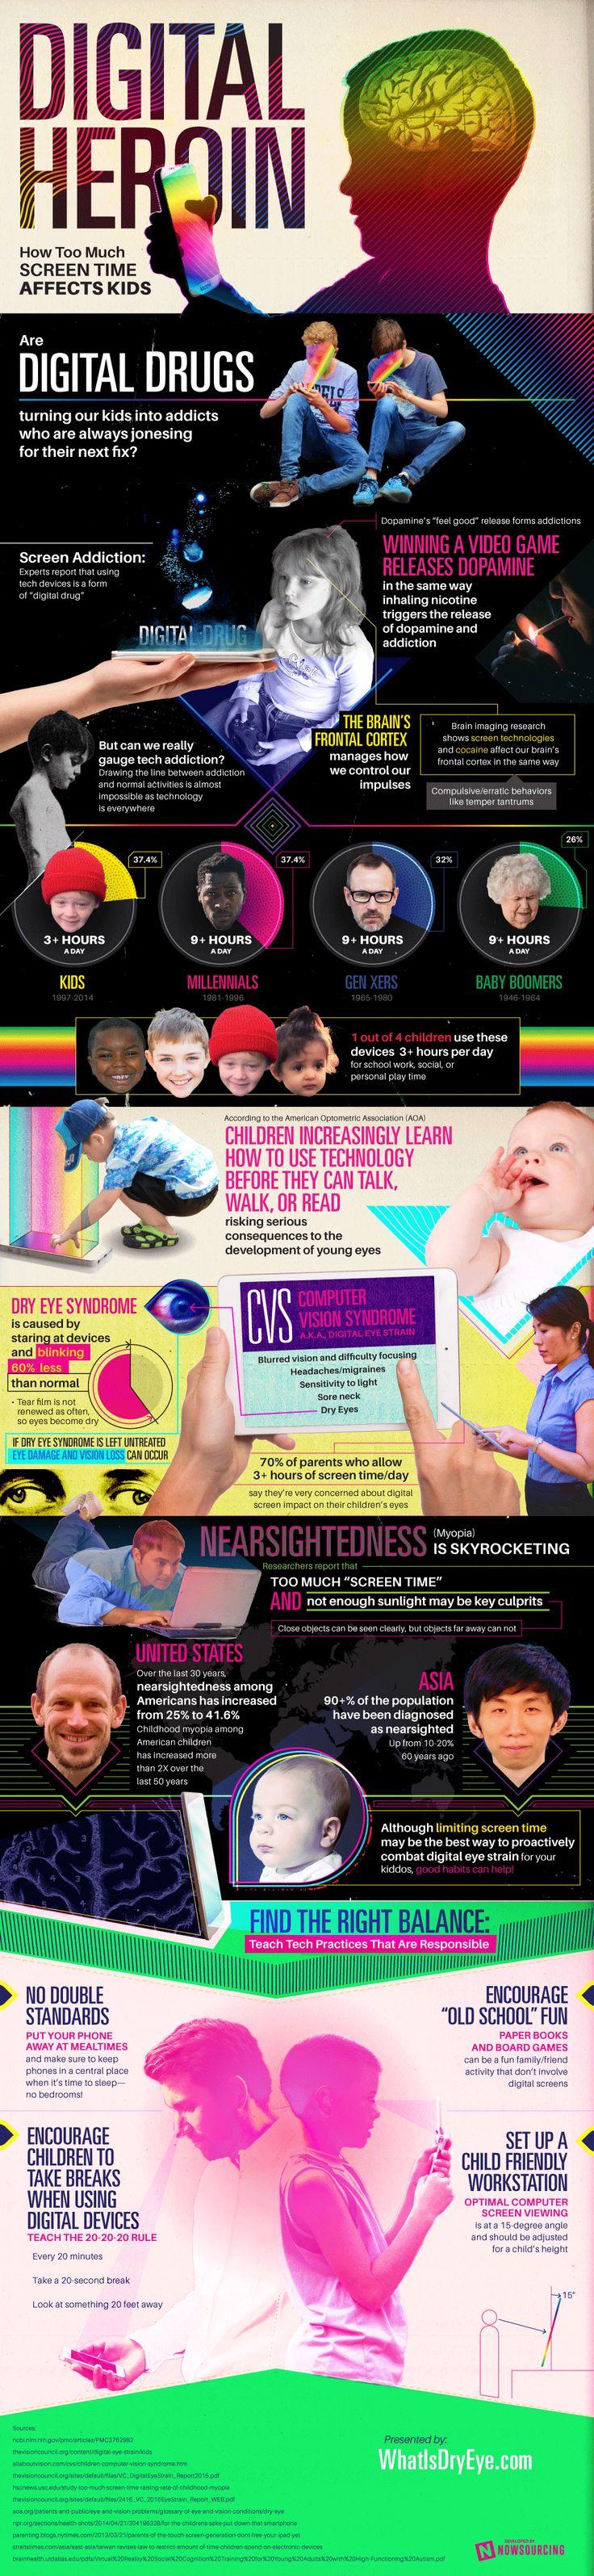 Digital Heroin: How Screen Time Is Affecting Kids #Infographic #DigitalDrugs #Kids